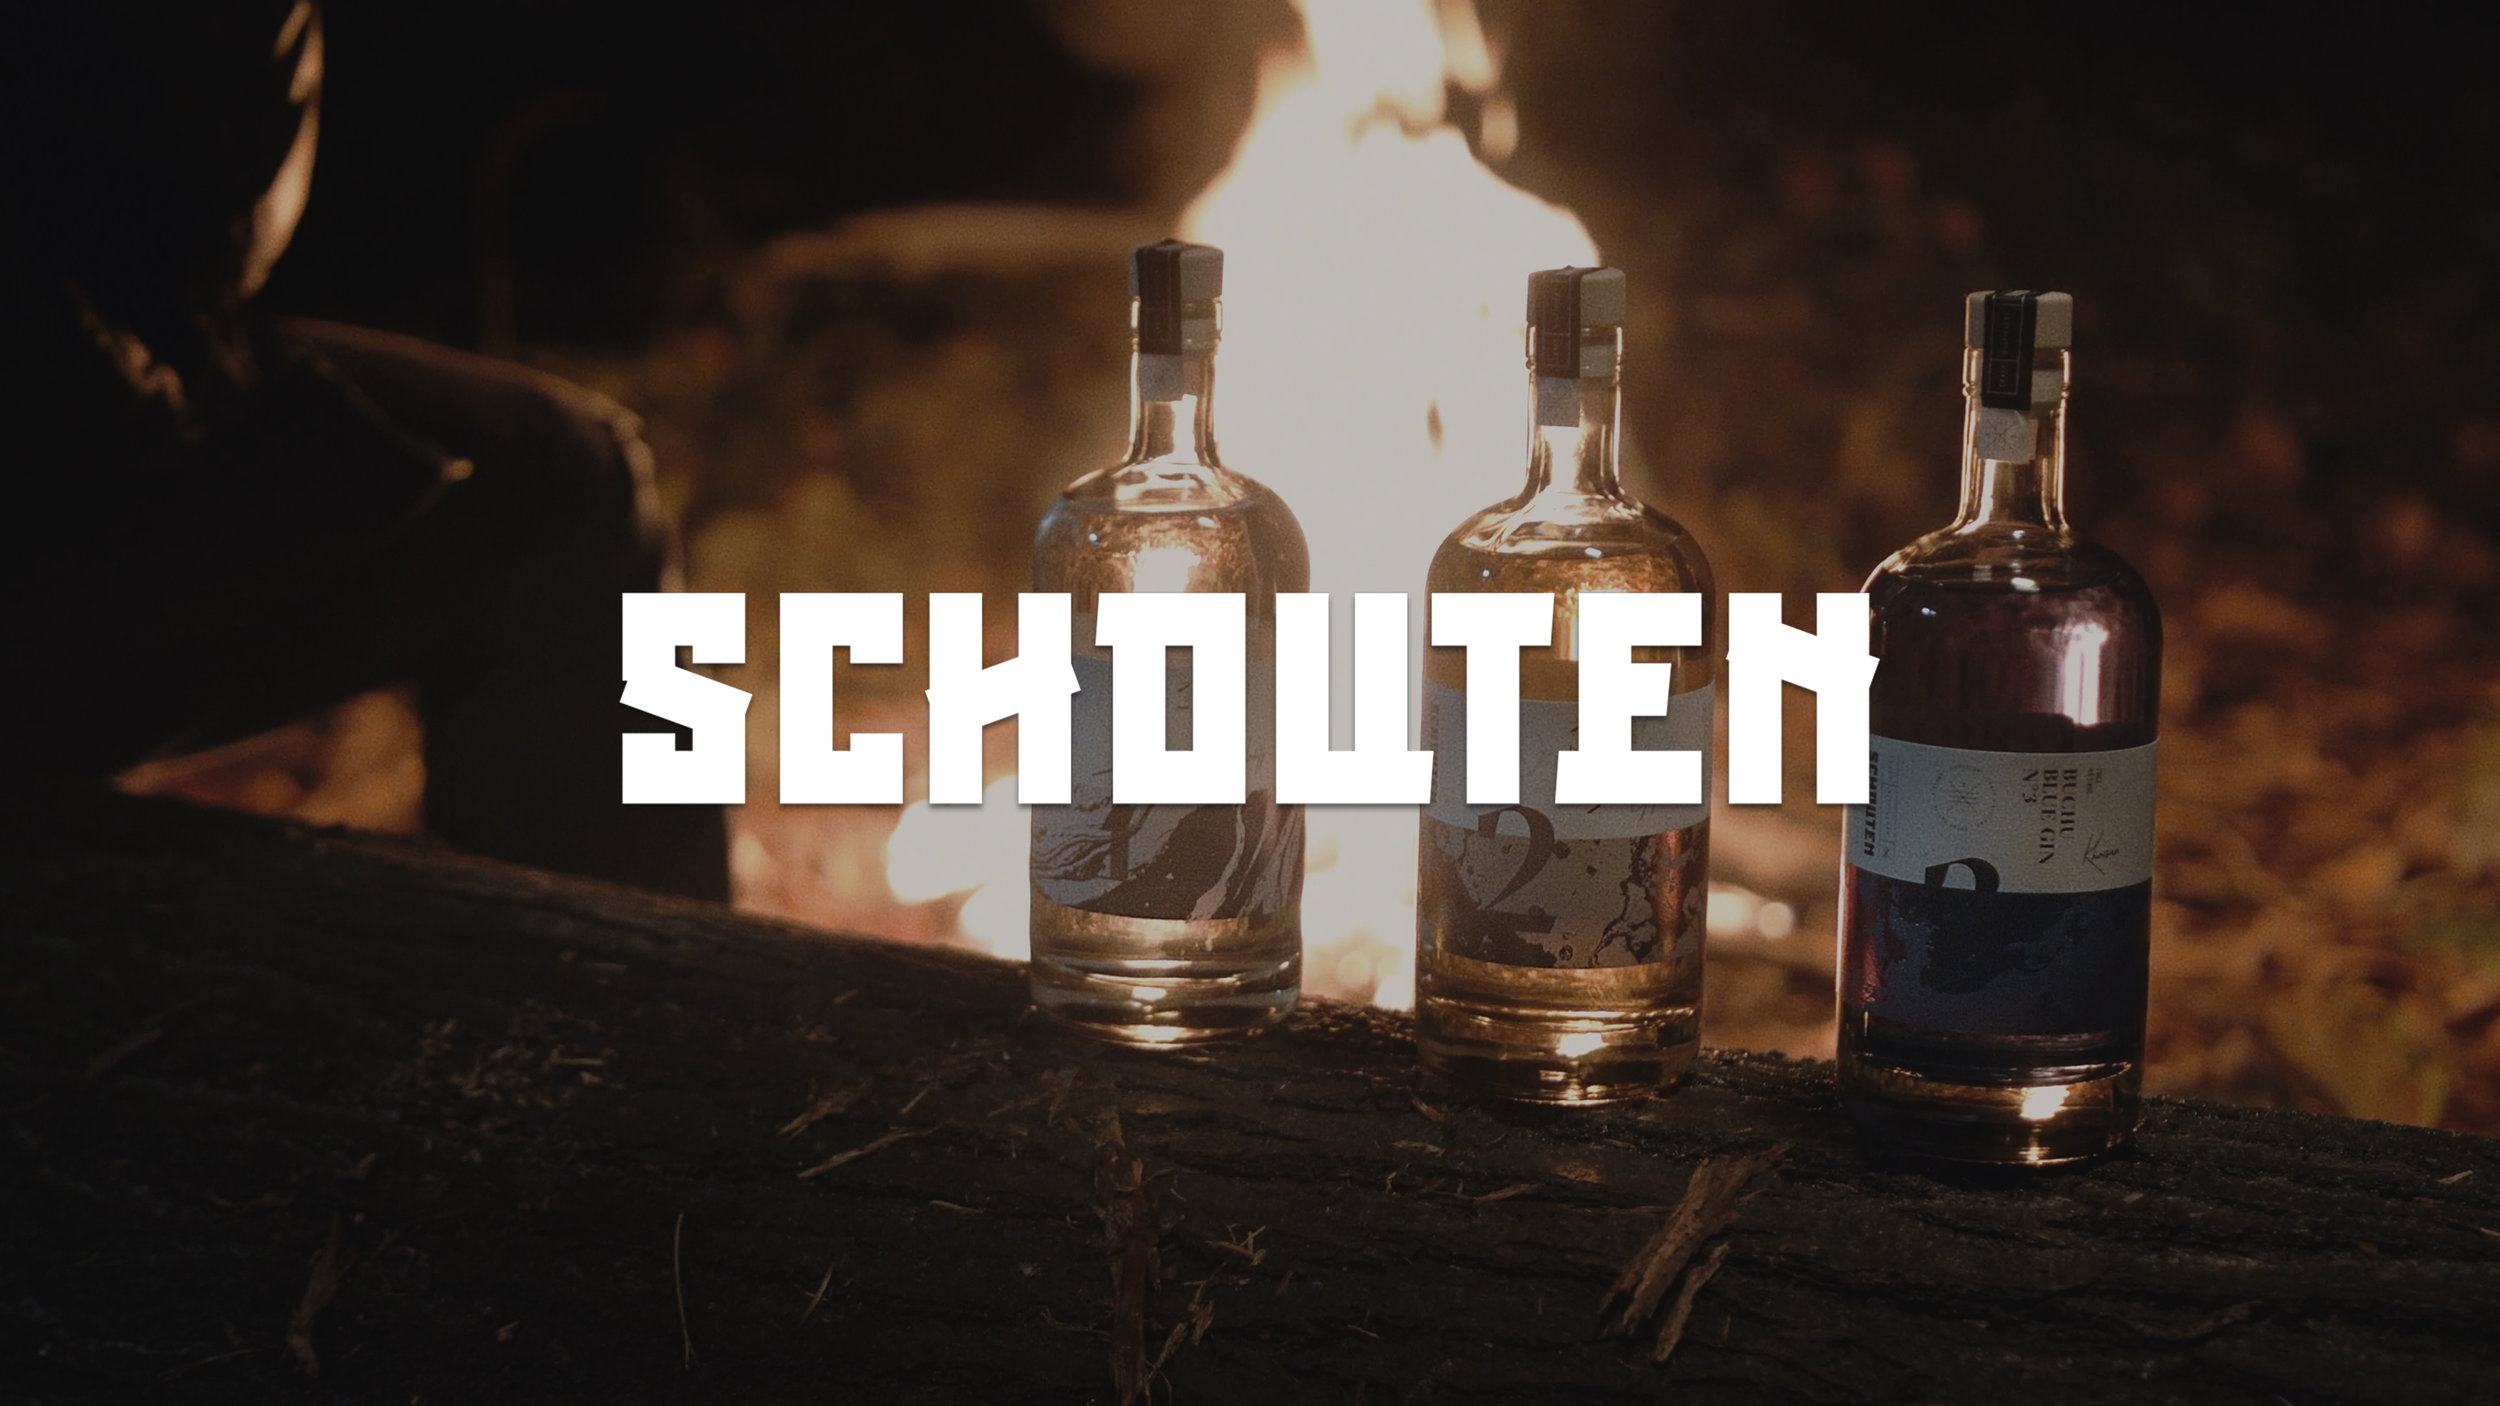 T_Schouten_Distillery.jpg